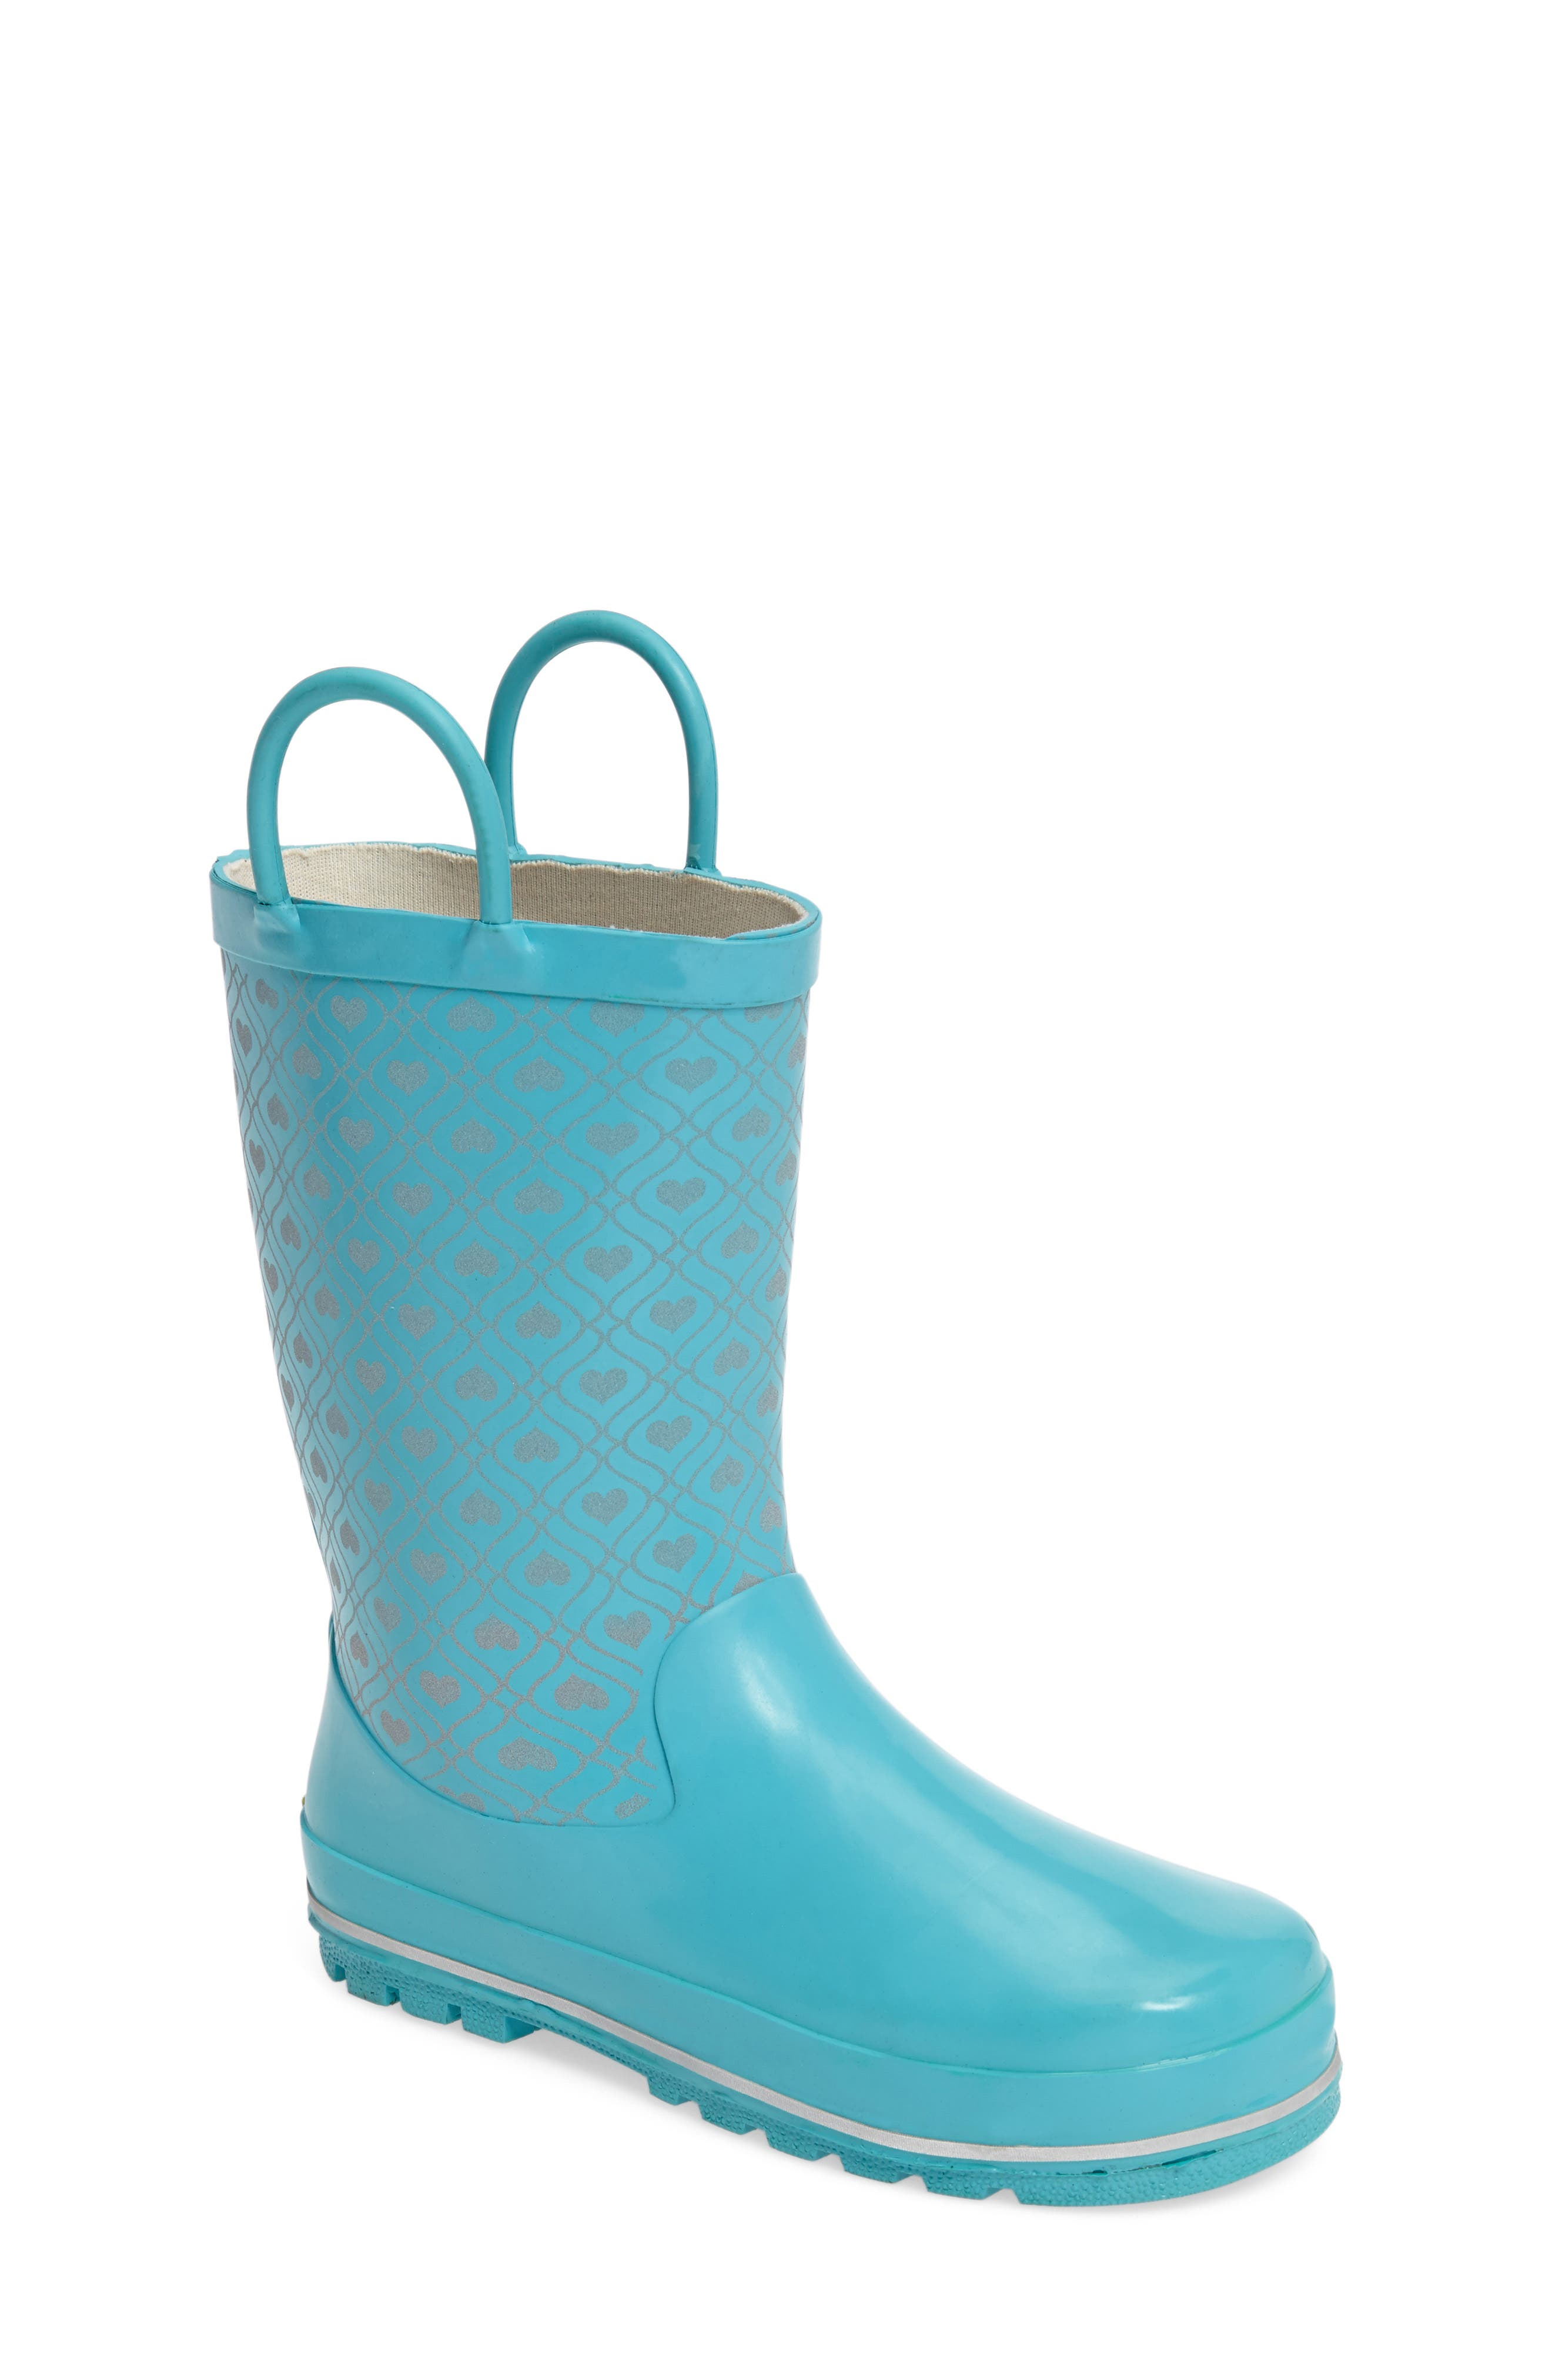 WESTERN CHIEF Reflective Hearts Rain Boot